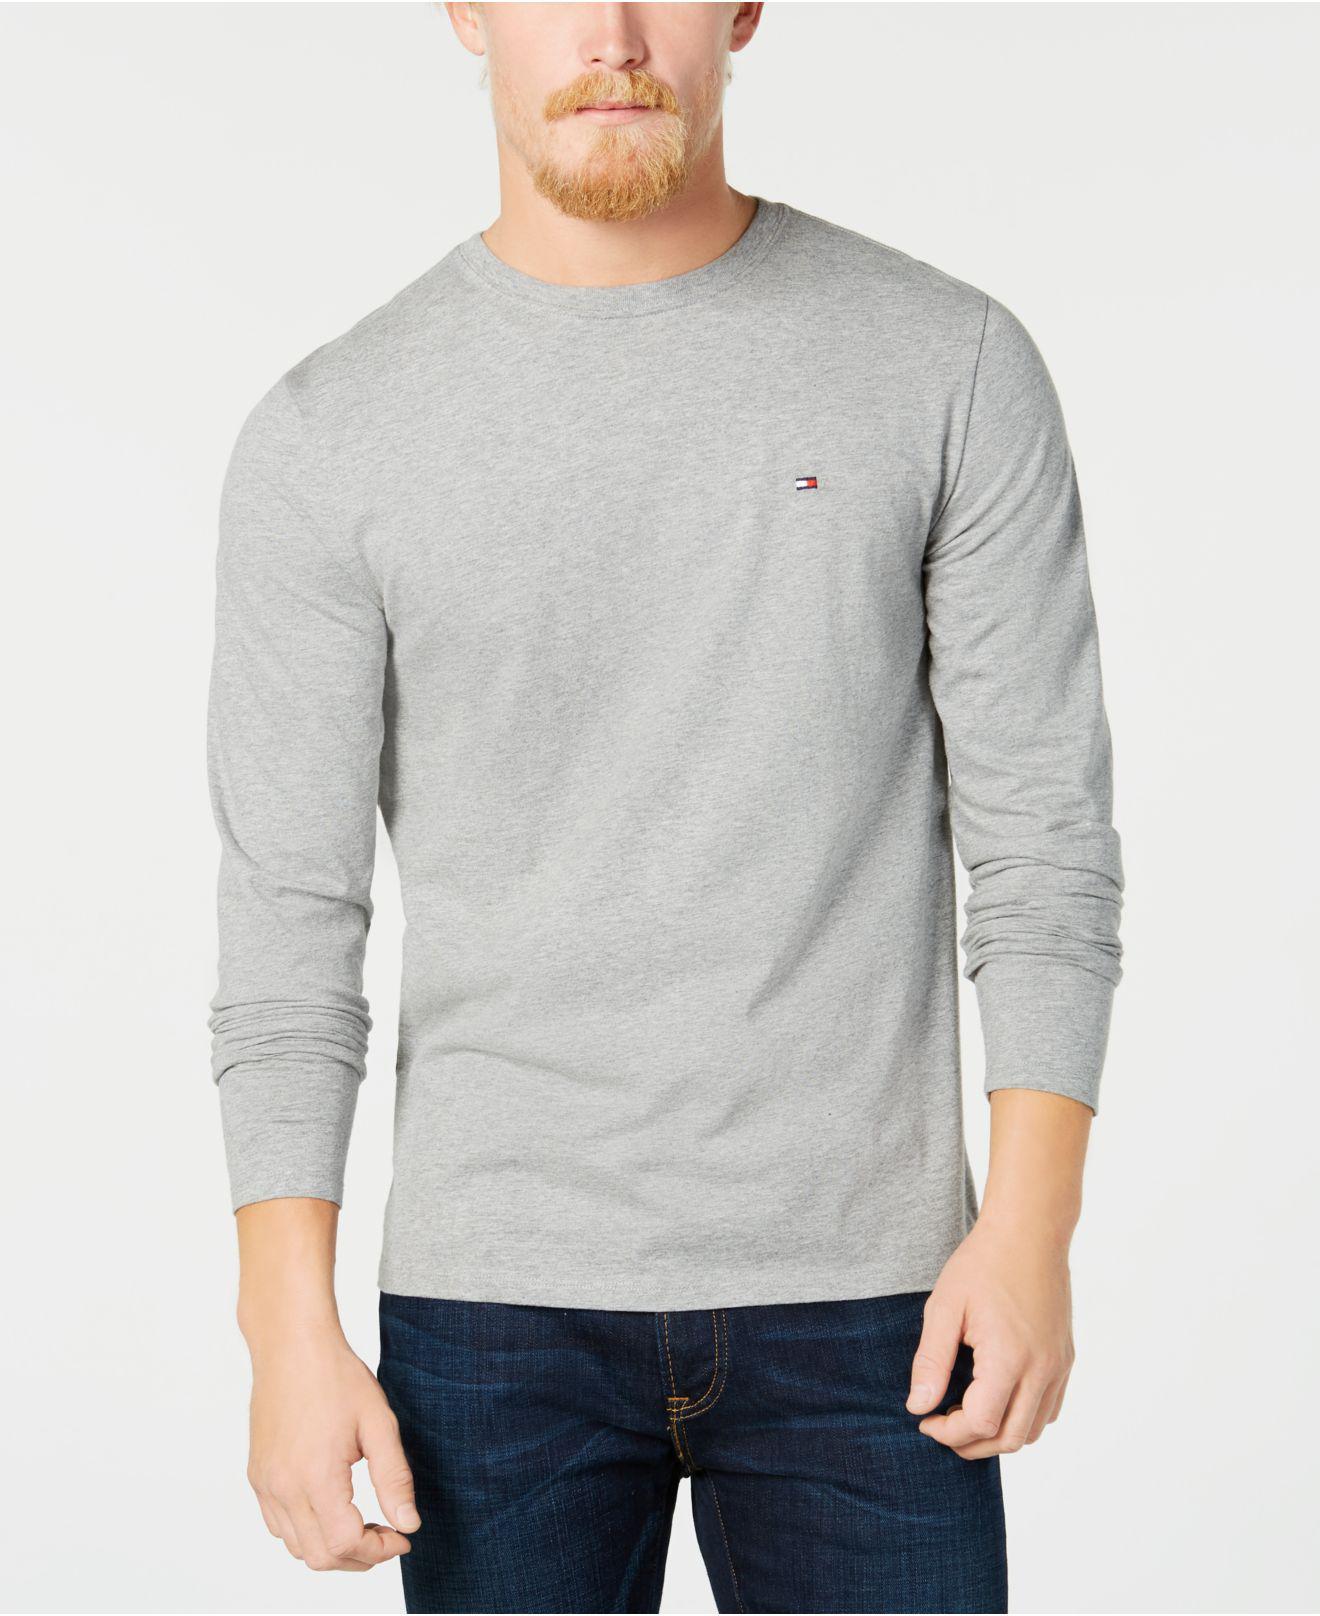 38e7695d661f35 Tommy Hilfiger. Men s Gray Nantucket T-shirt